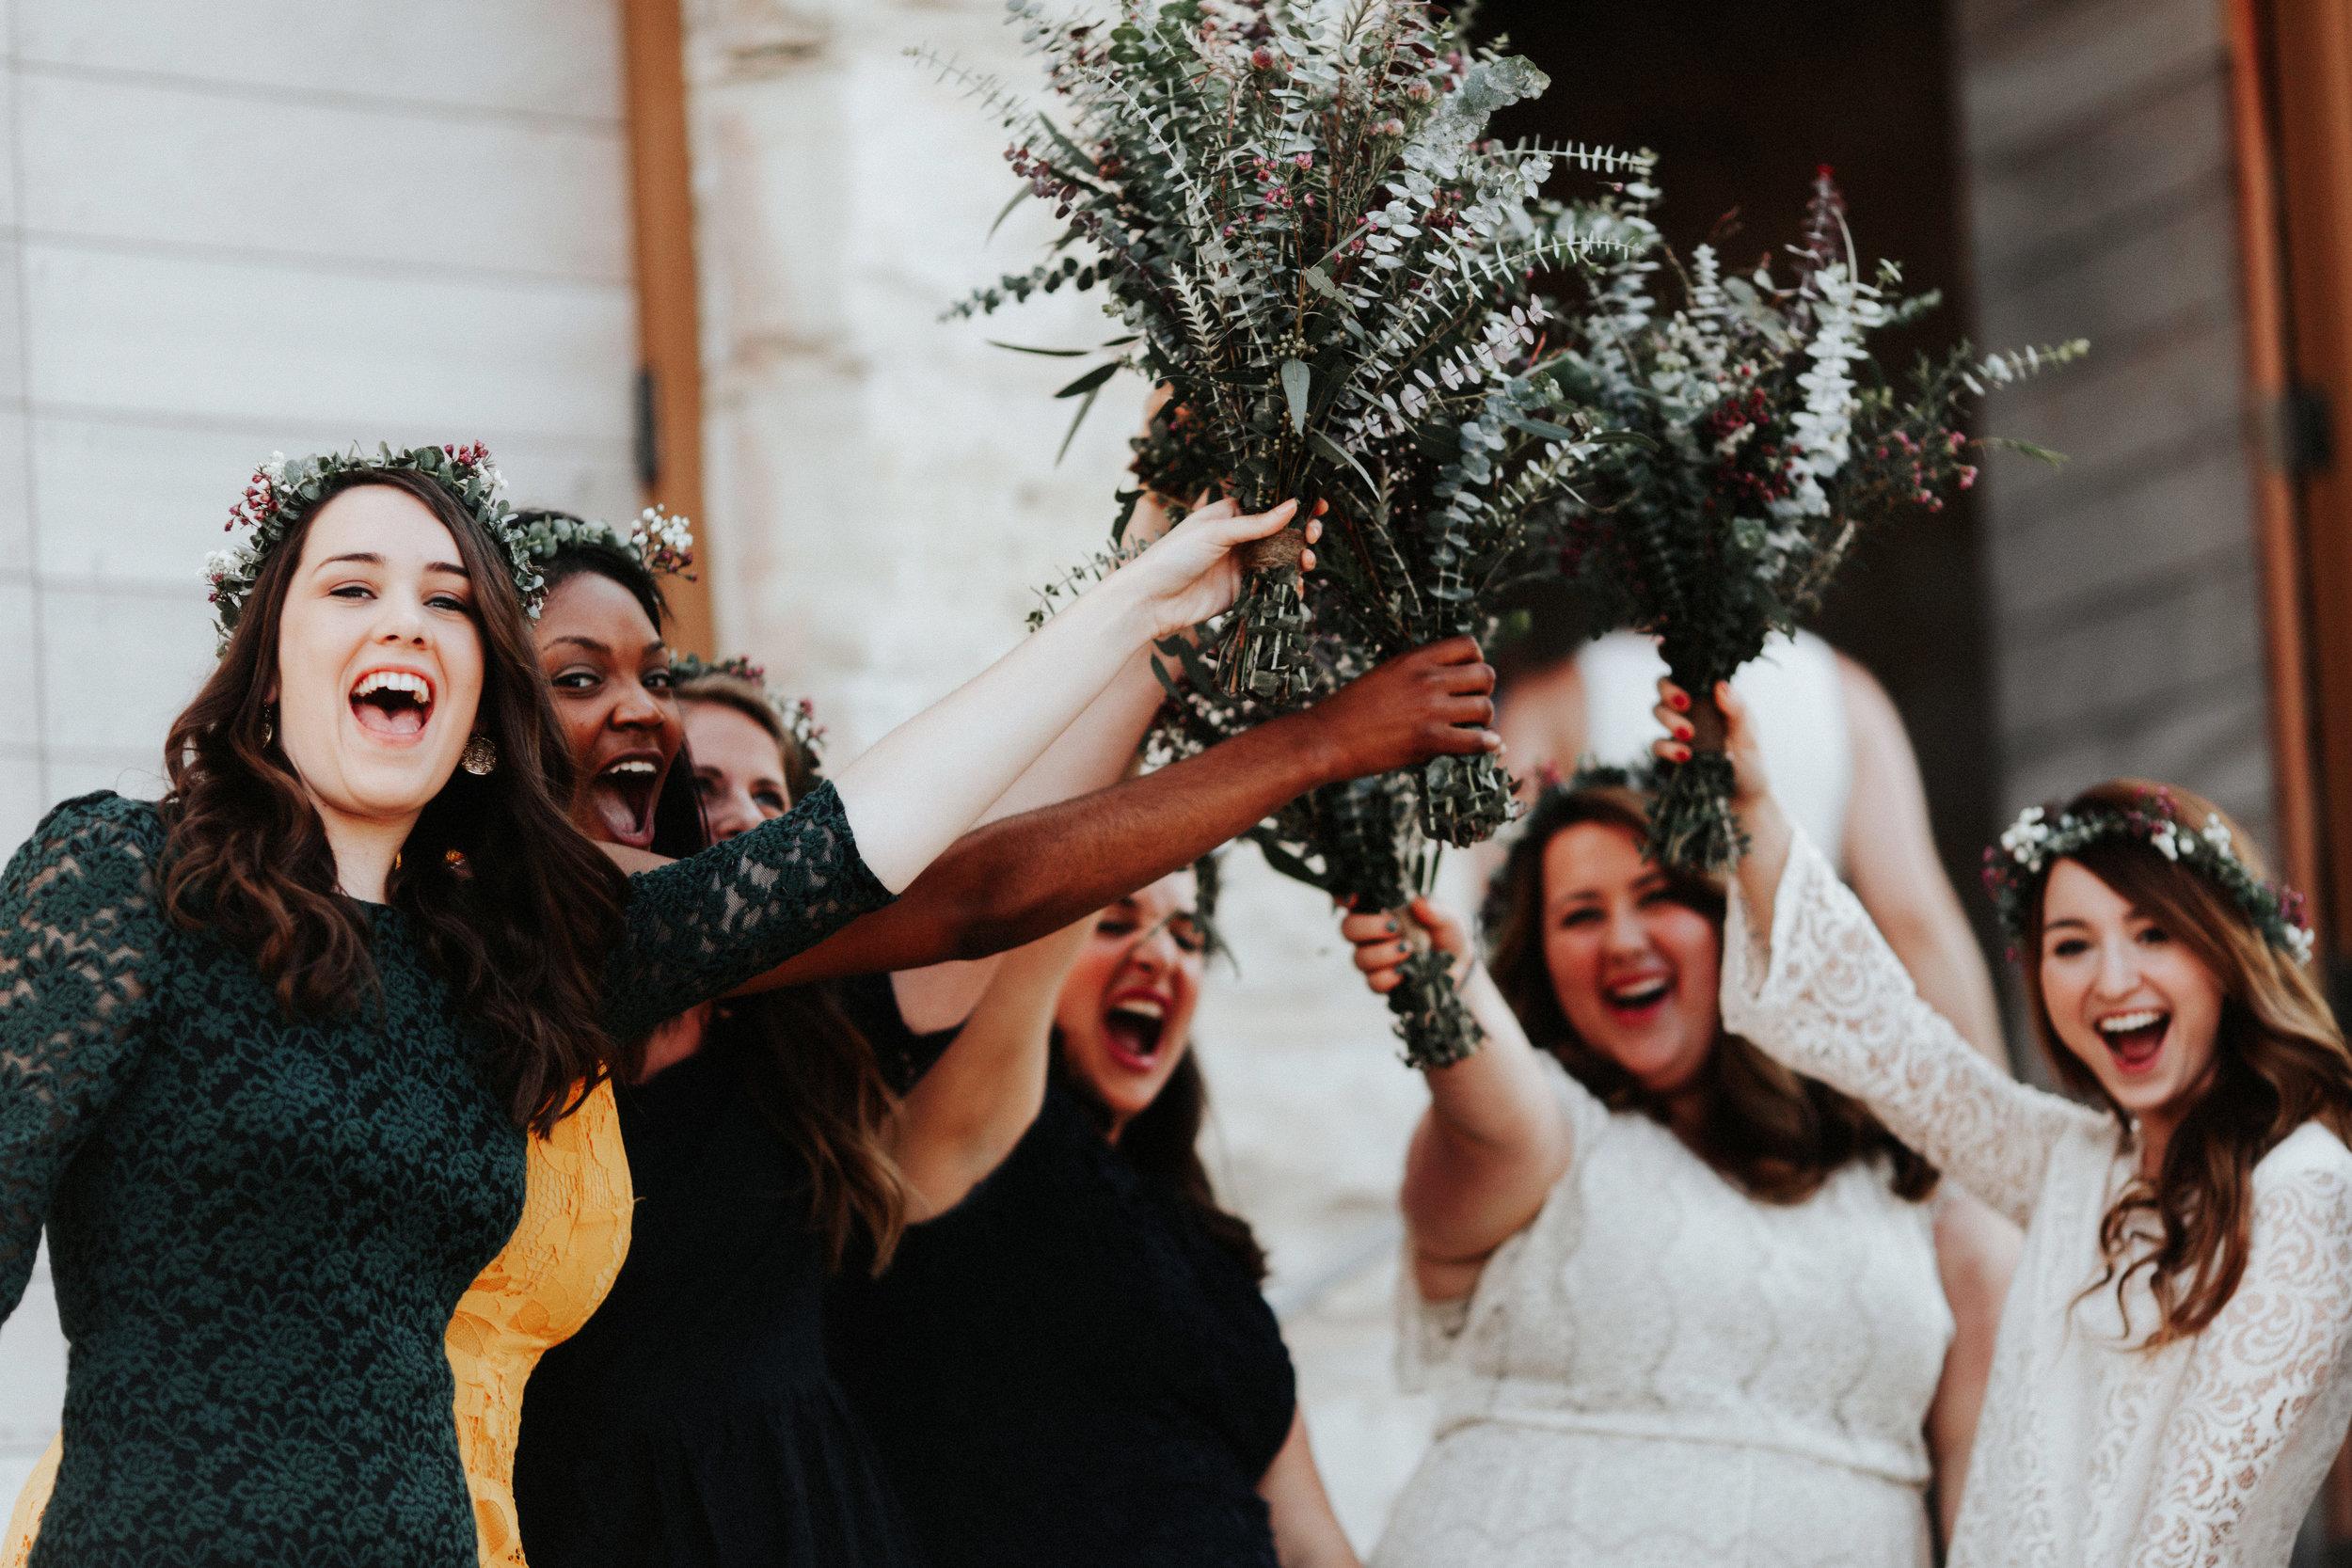 austin-wedding-photographer-37.jpg